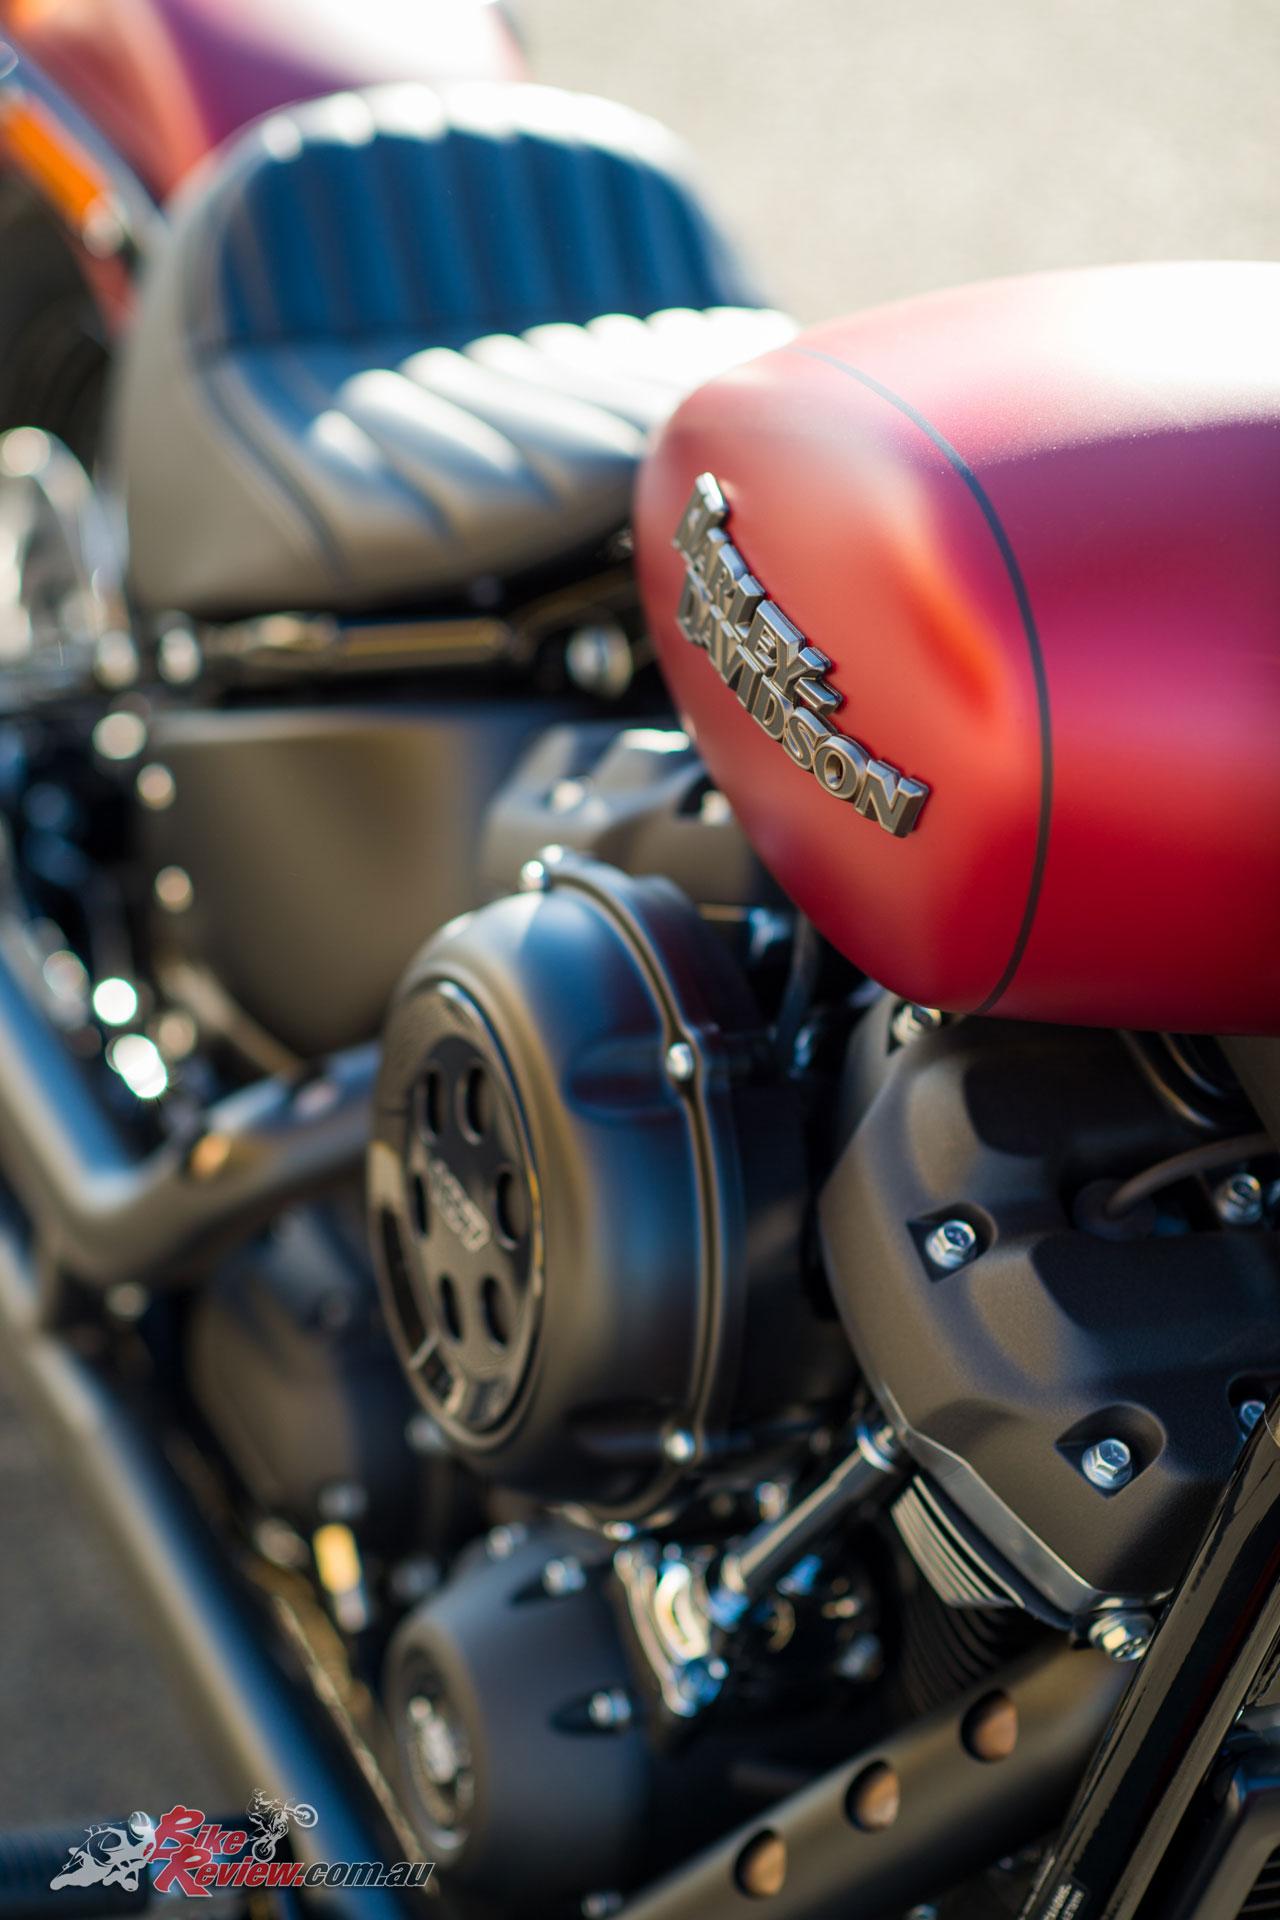 2019 Harley-Davidson Softail Tour